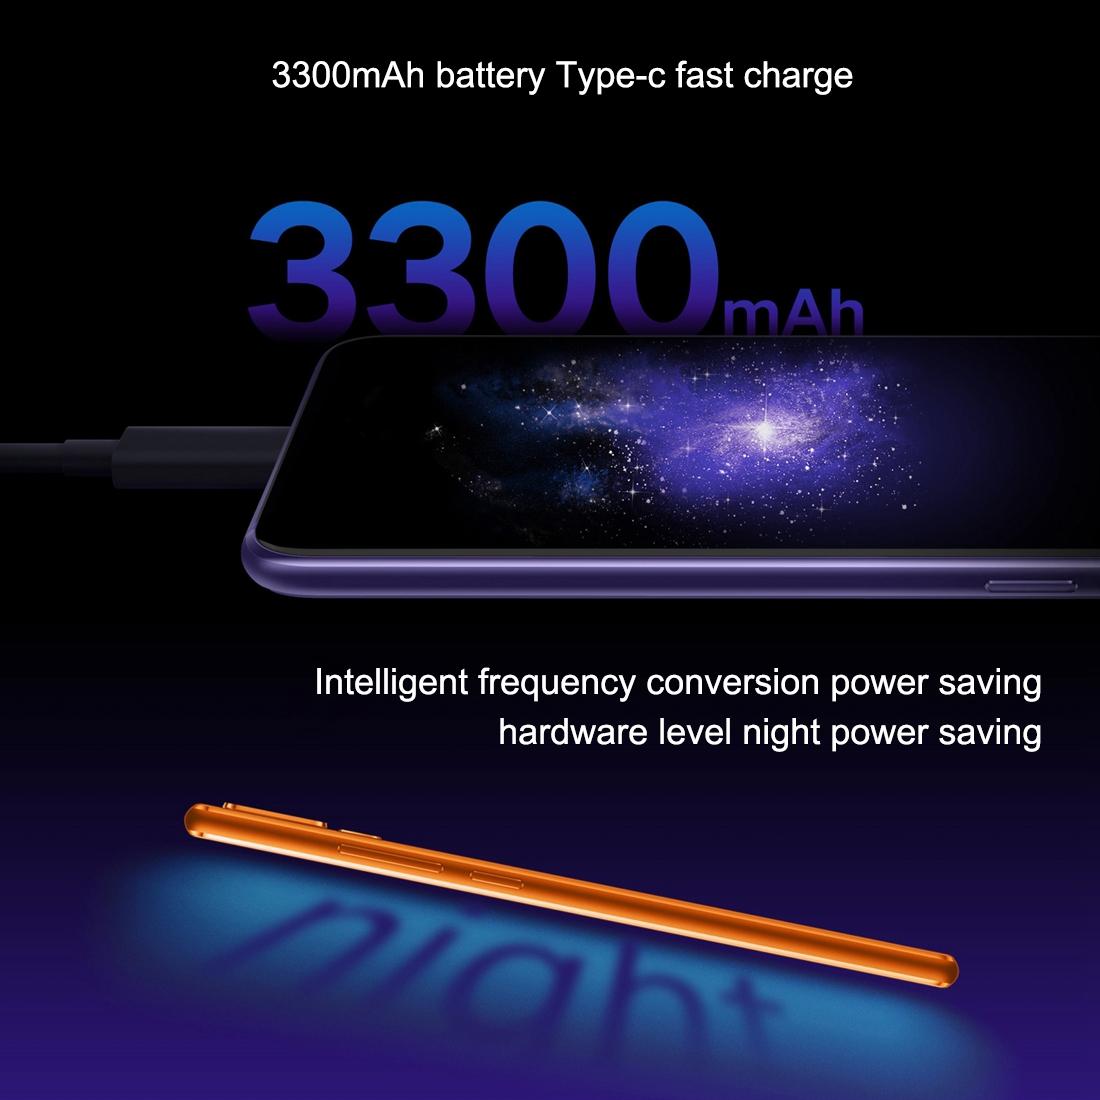 i.ibb.co/b1XX4Nx/Smartphone-6-GB-de-RAM-128-GB-de-ROM-Lenovo-Z5s-11.jpg